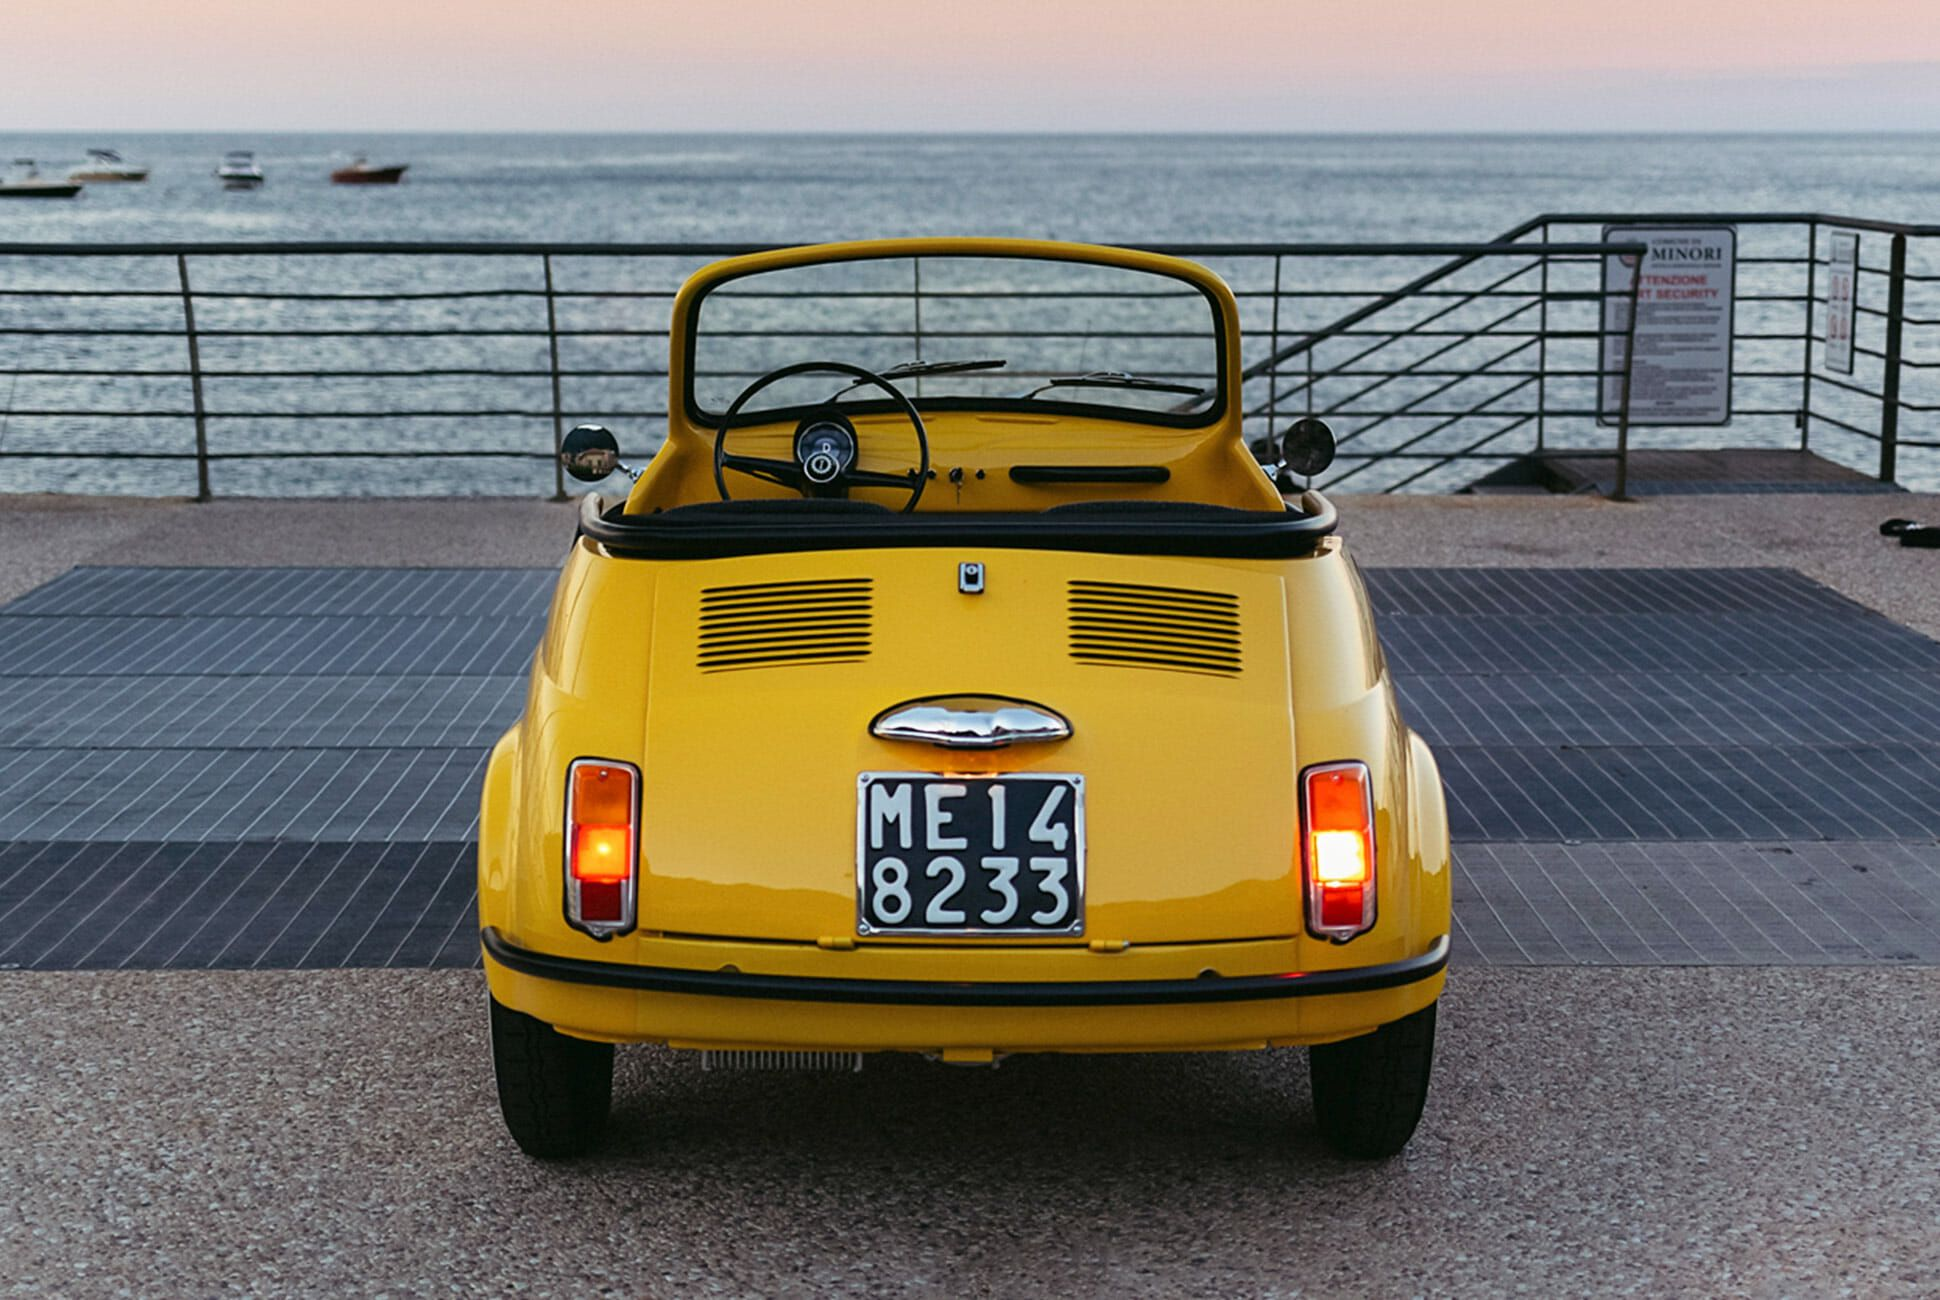 Fiat-Electric-Vehicles-gear-patrol-slide-3